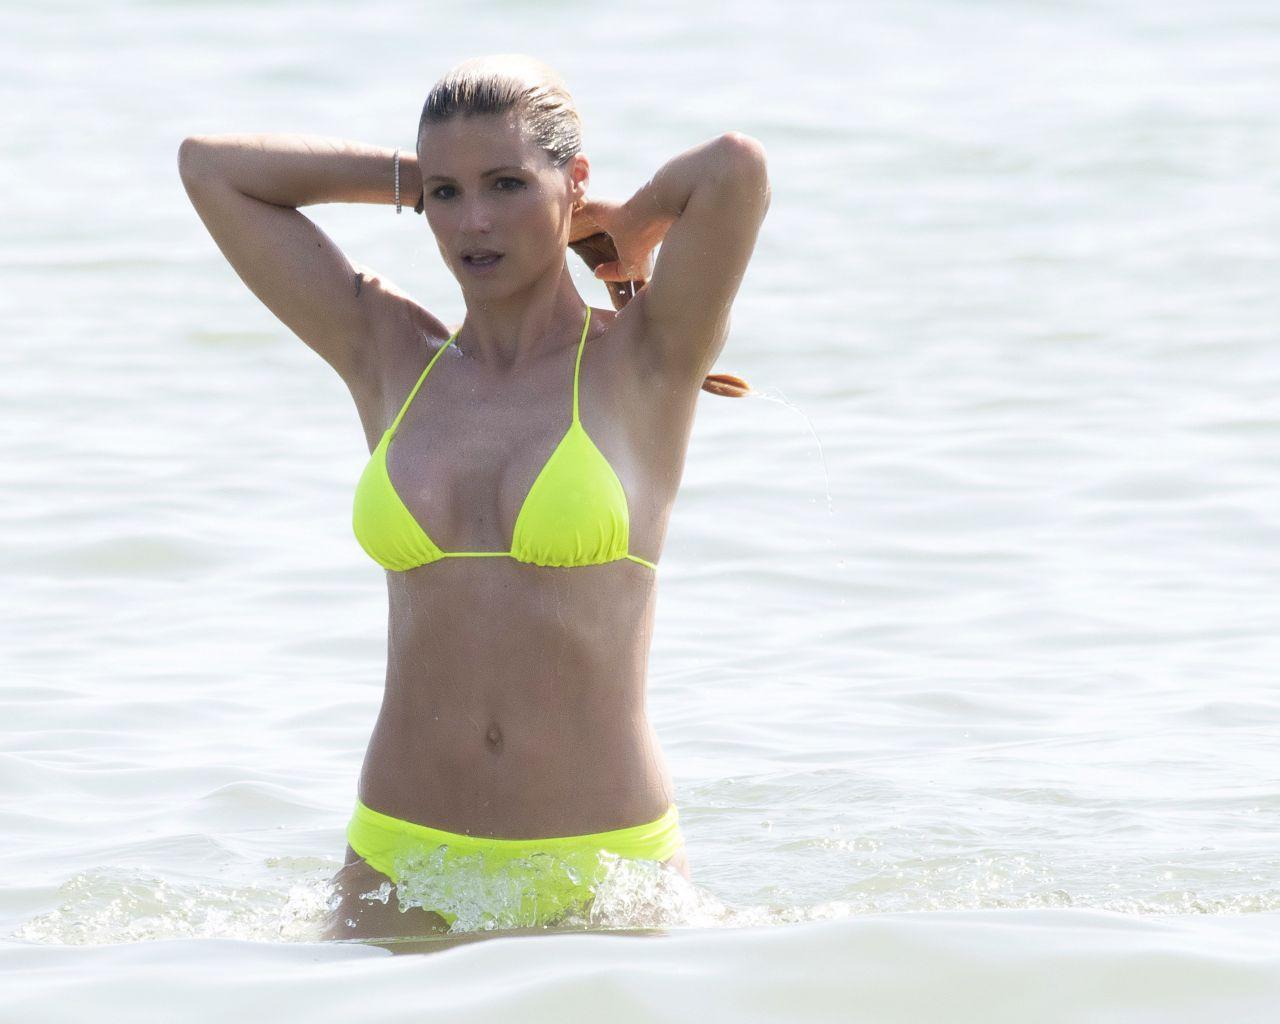 Michelle Hunziker In A Bikini On The Beach In Milano Marittima 07 Images, Photos, Reviews